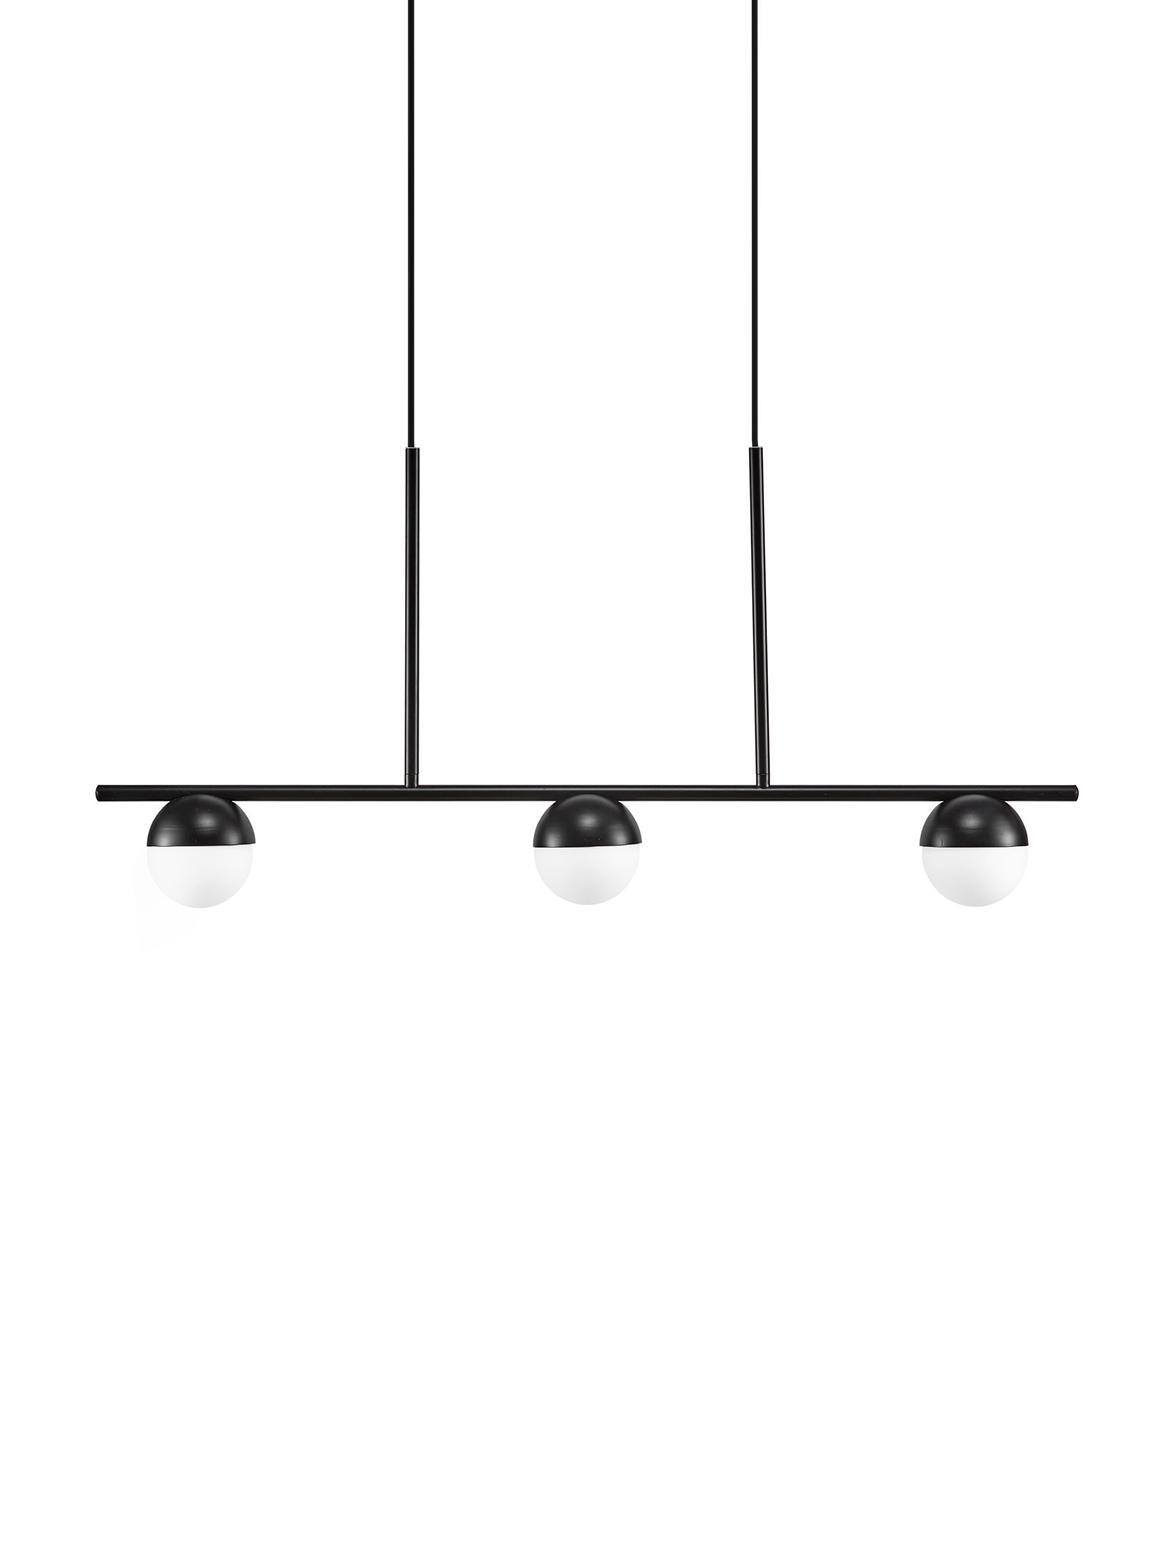 Große Pendelleuchte Contina, Lampenschirm: Opalglas, Baldachin: Metall, beschichtet, Weiß, Schwarz, 90 x 242 cm